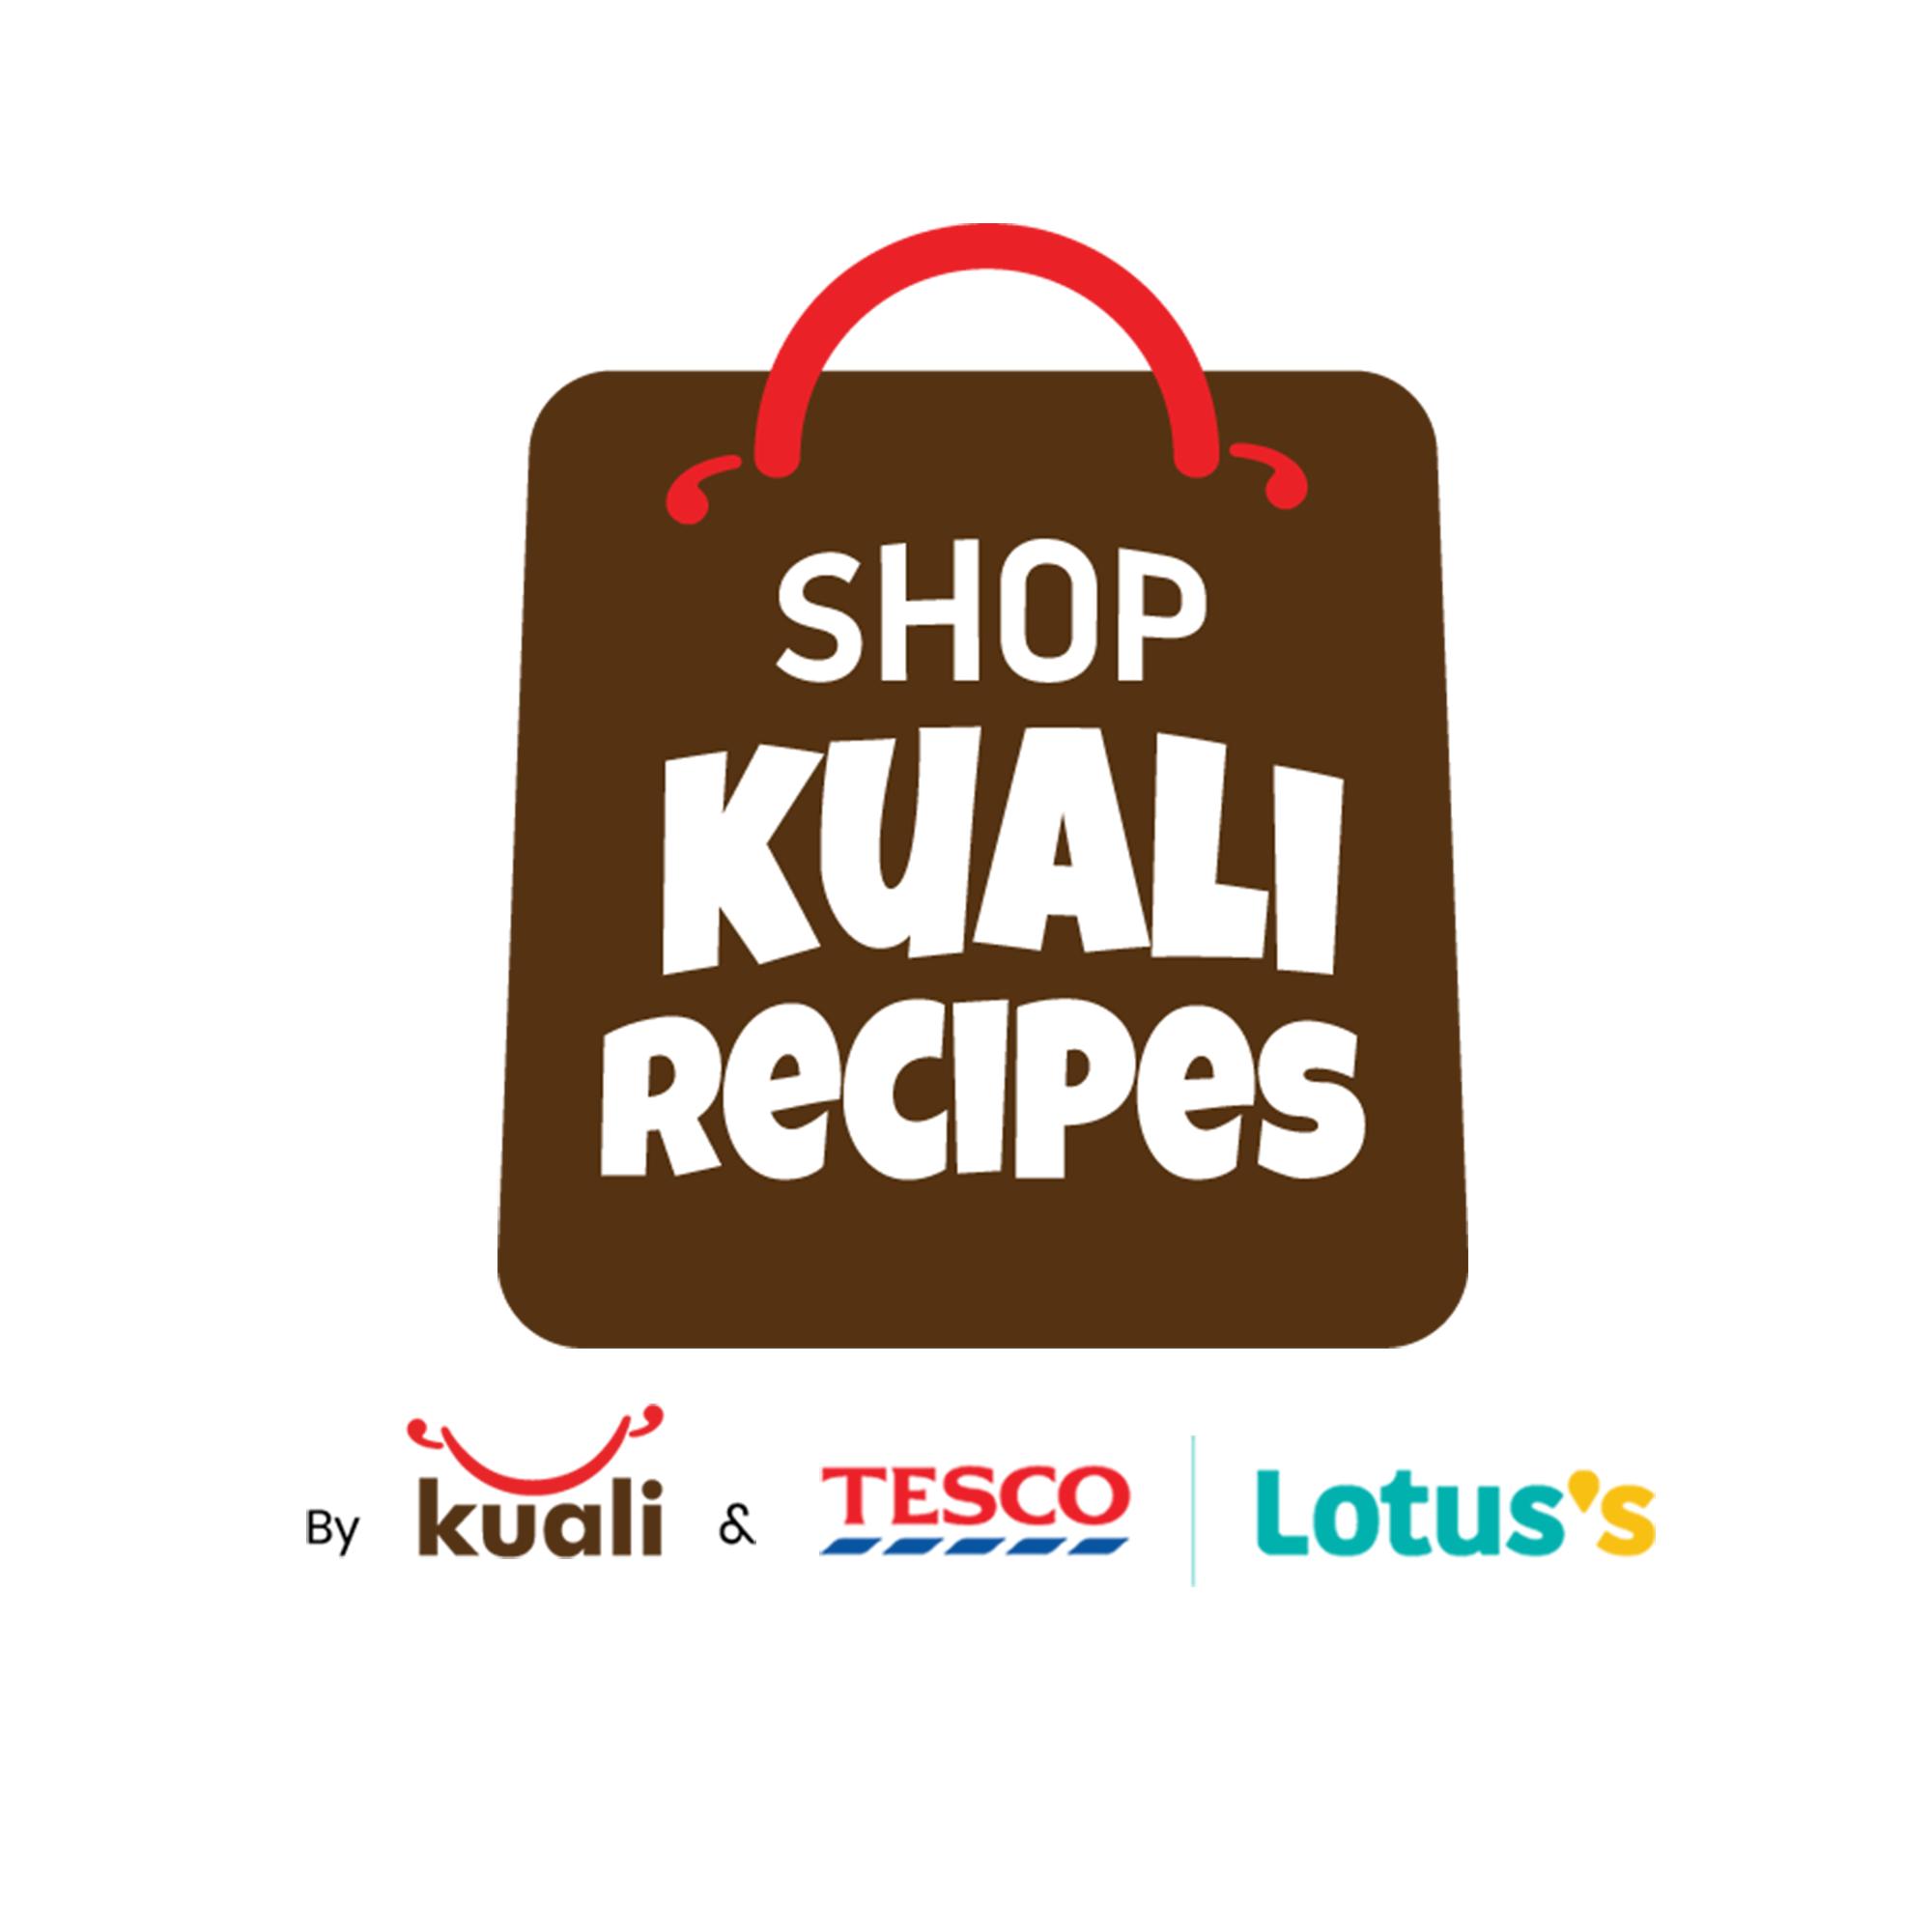 Shop Kuali Recipes